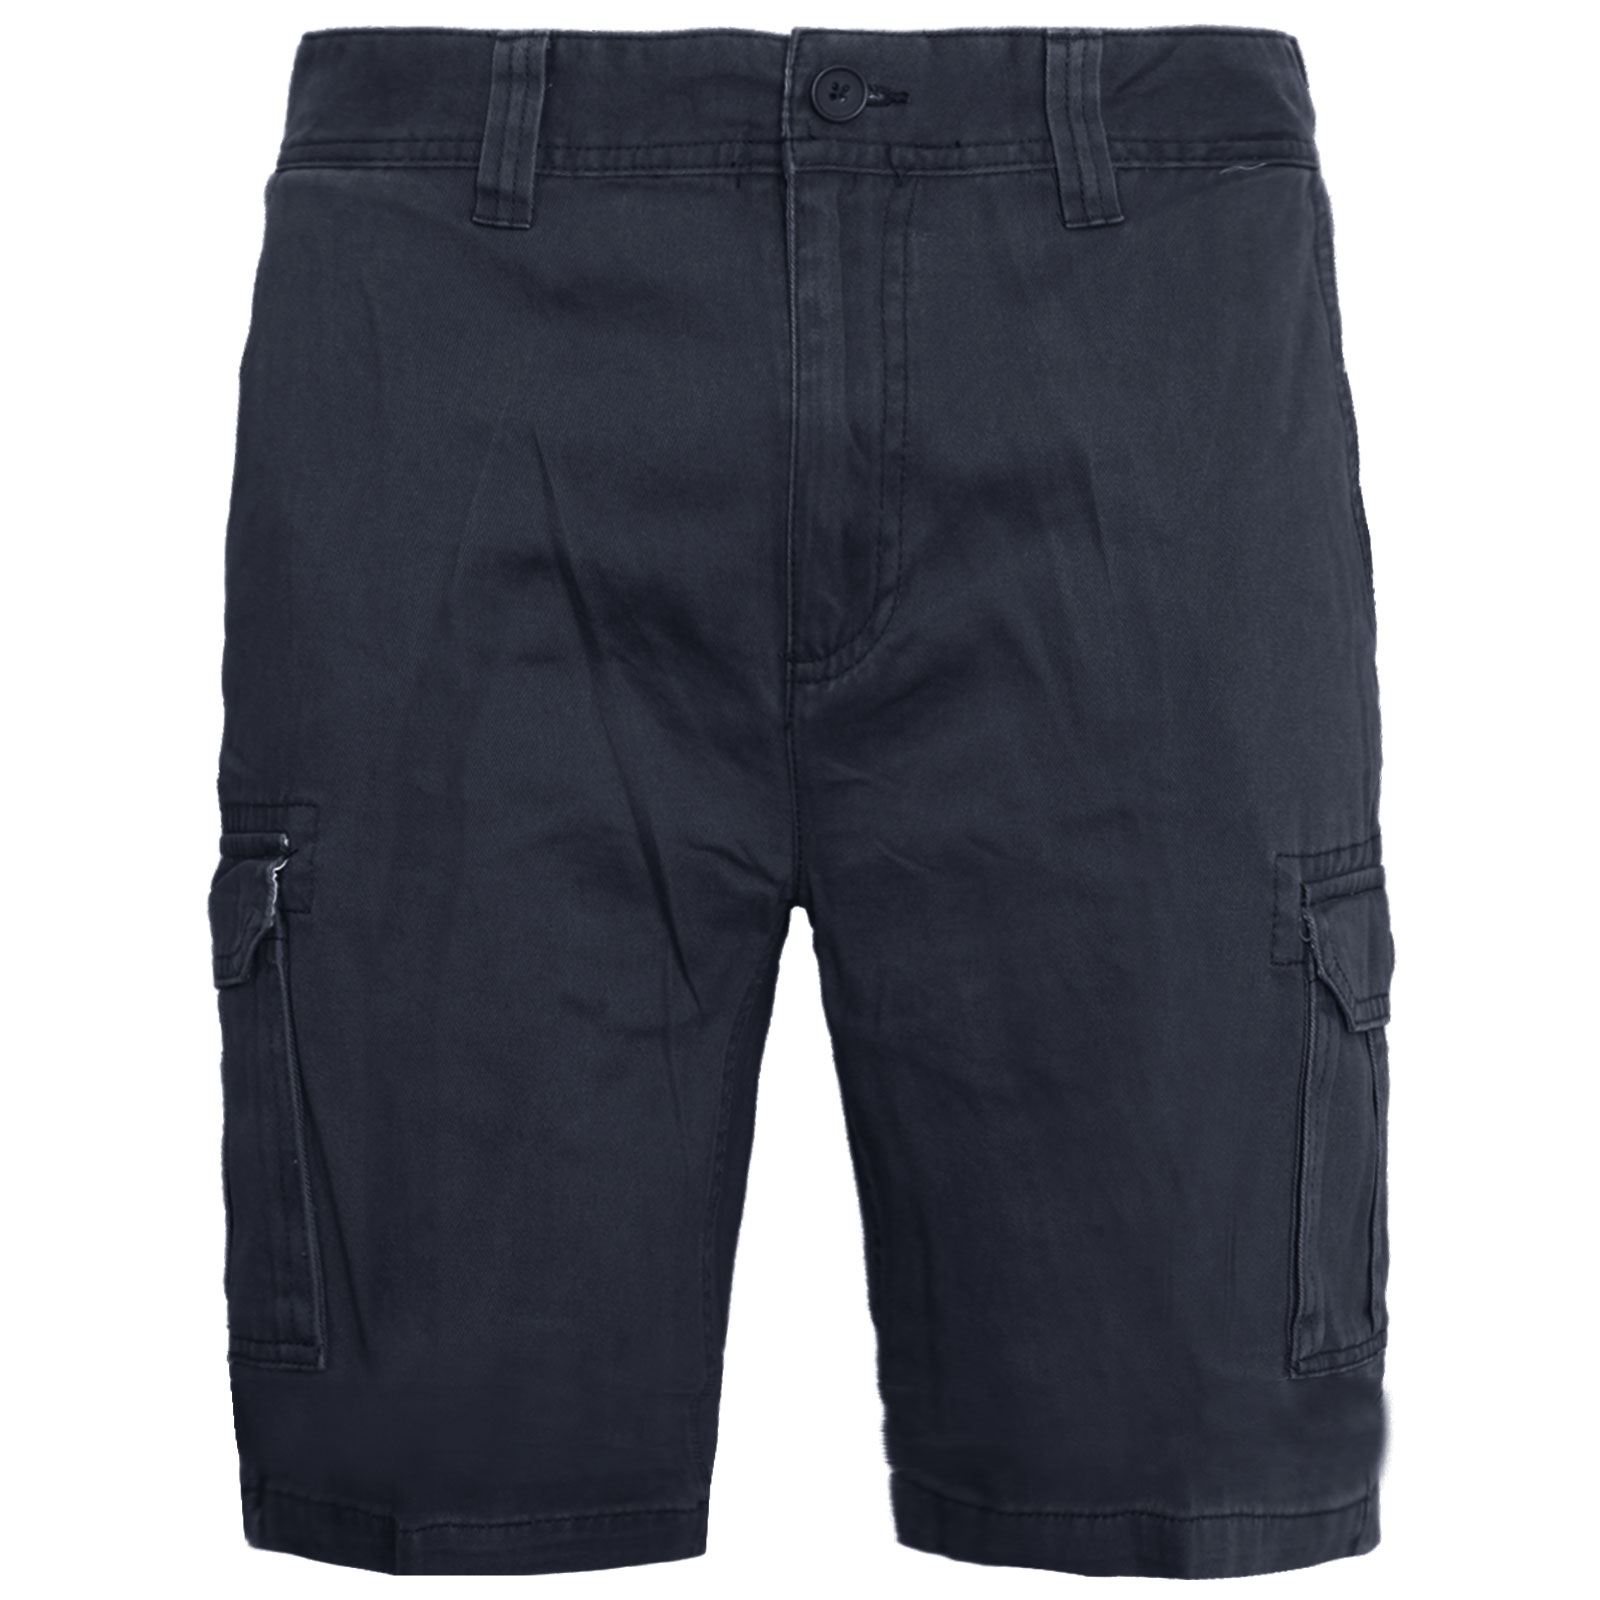 Mens-Multi-Pocket-Cargo-Shorts-Combat-Chino-Half-Pants-100-Cotton-Work-30-46 thumbnail 14